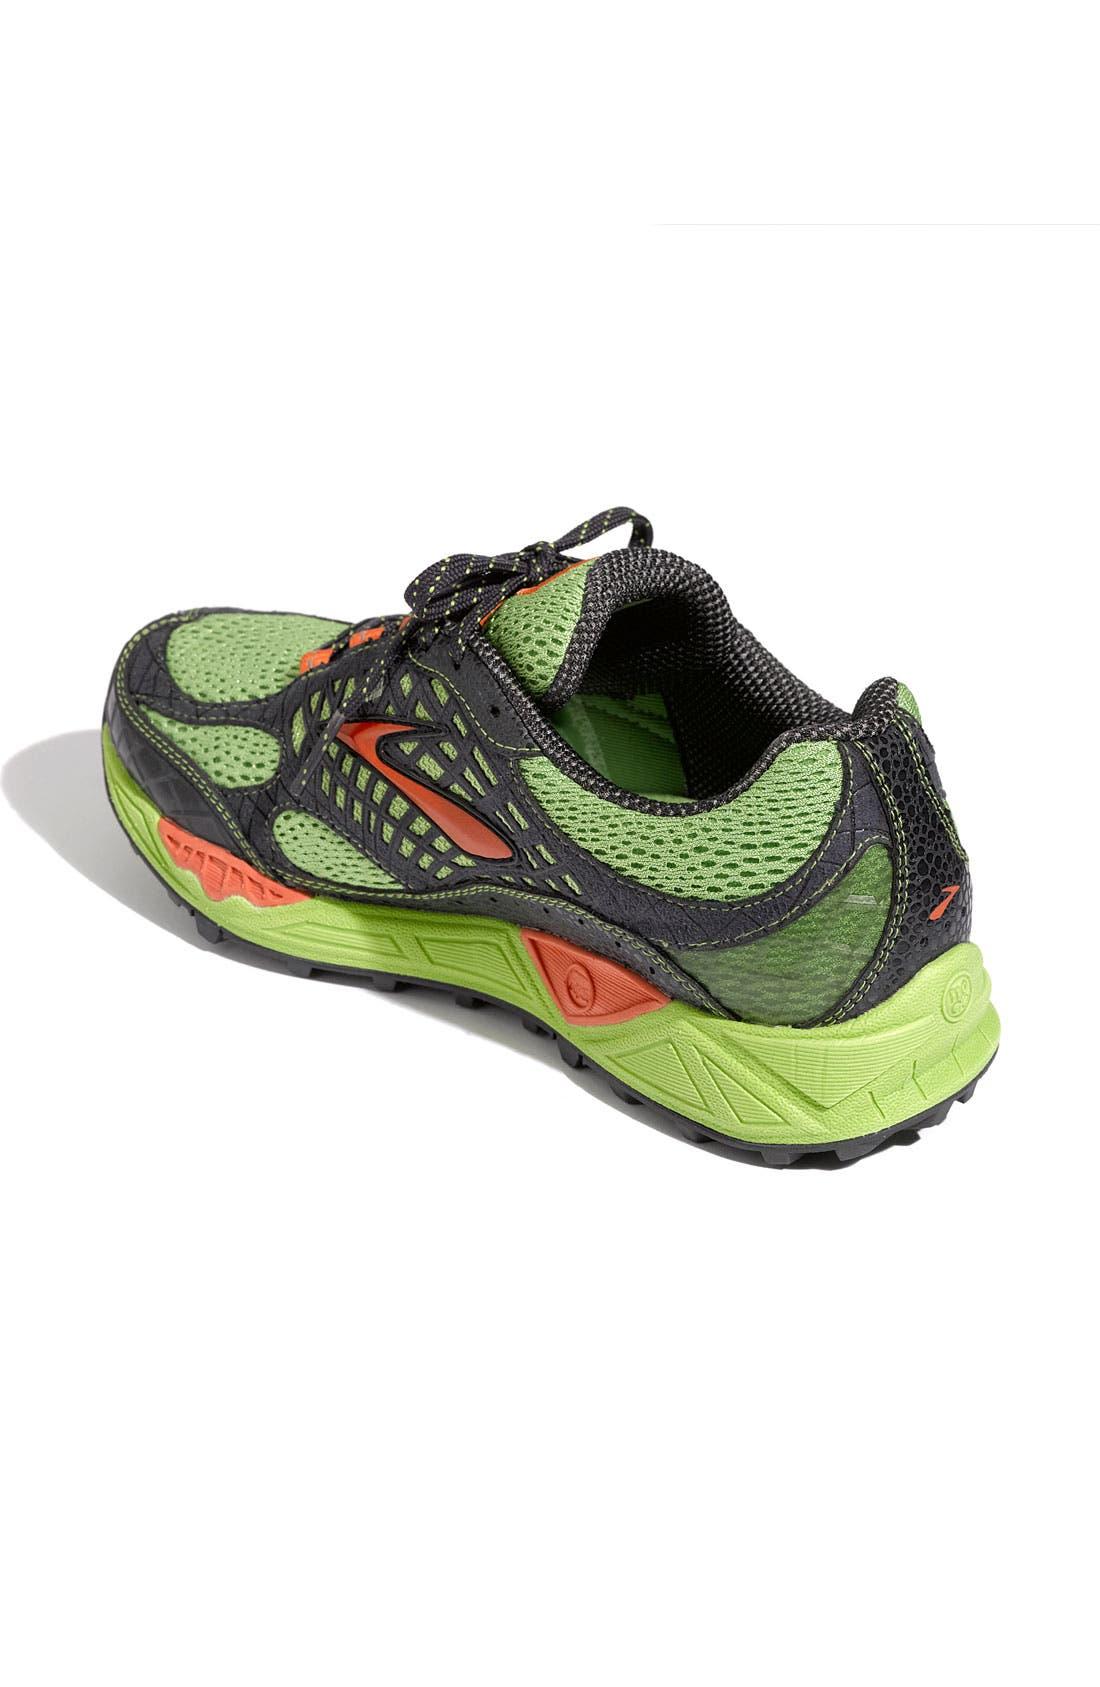 Alternate Image 2  - Brooks 'Cascadia 7' Running Shoe (Women)